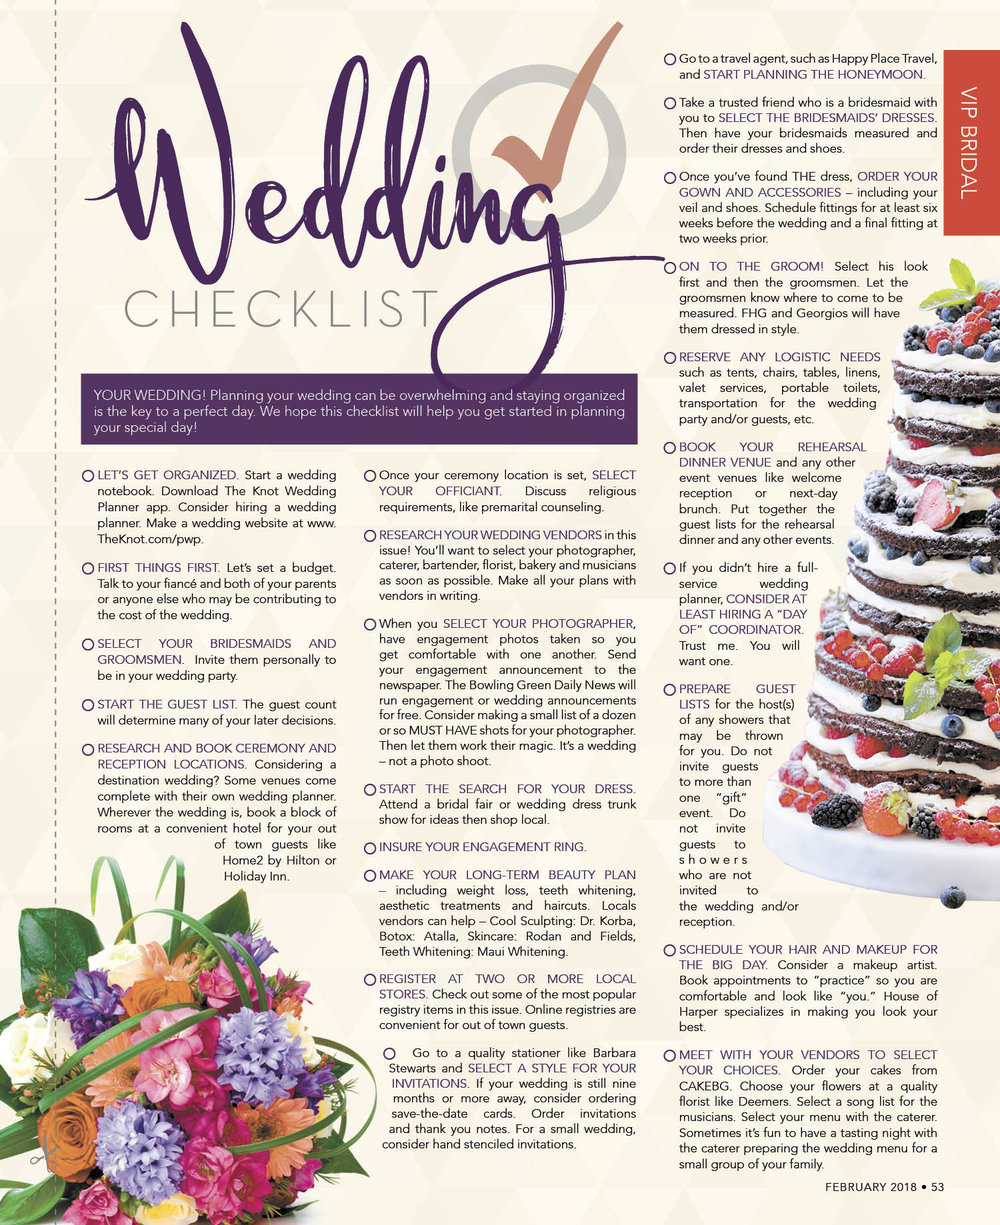 Wedding_Checklist_small.jpg